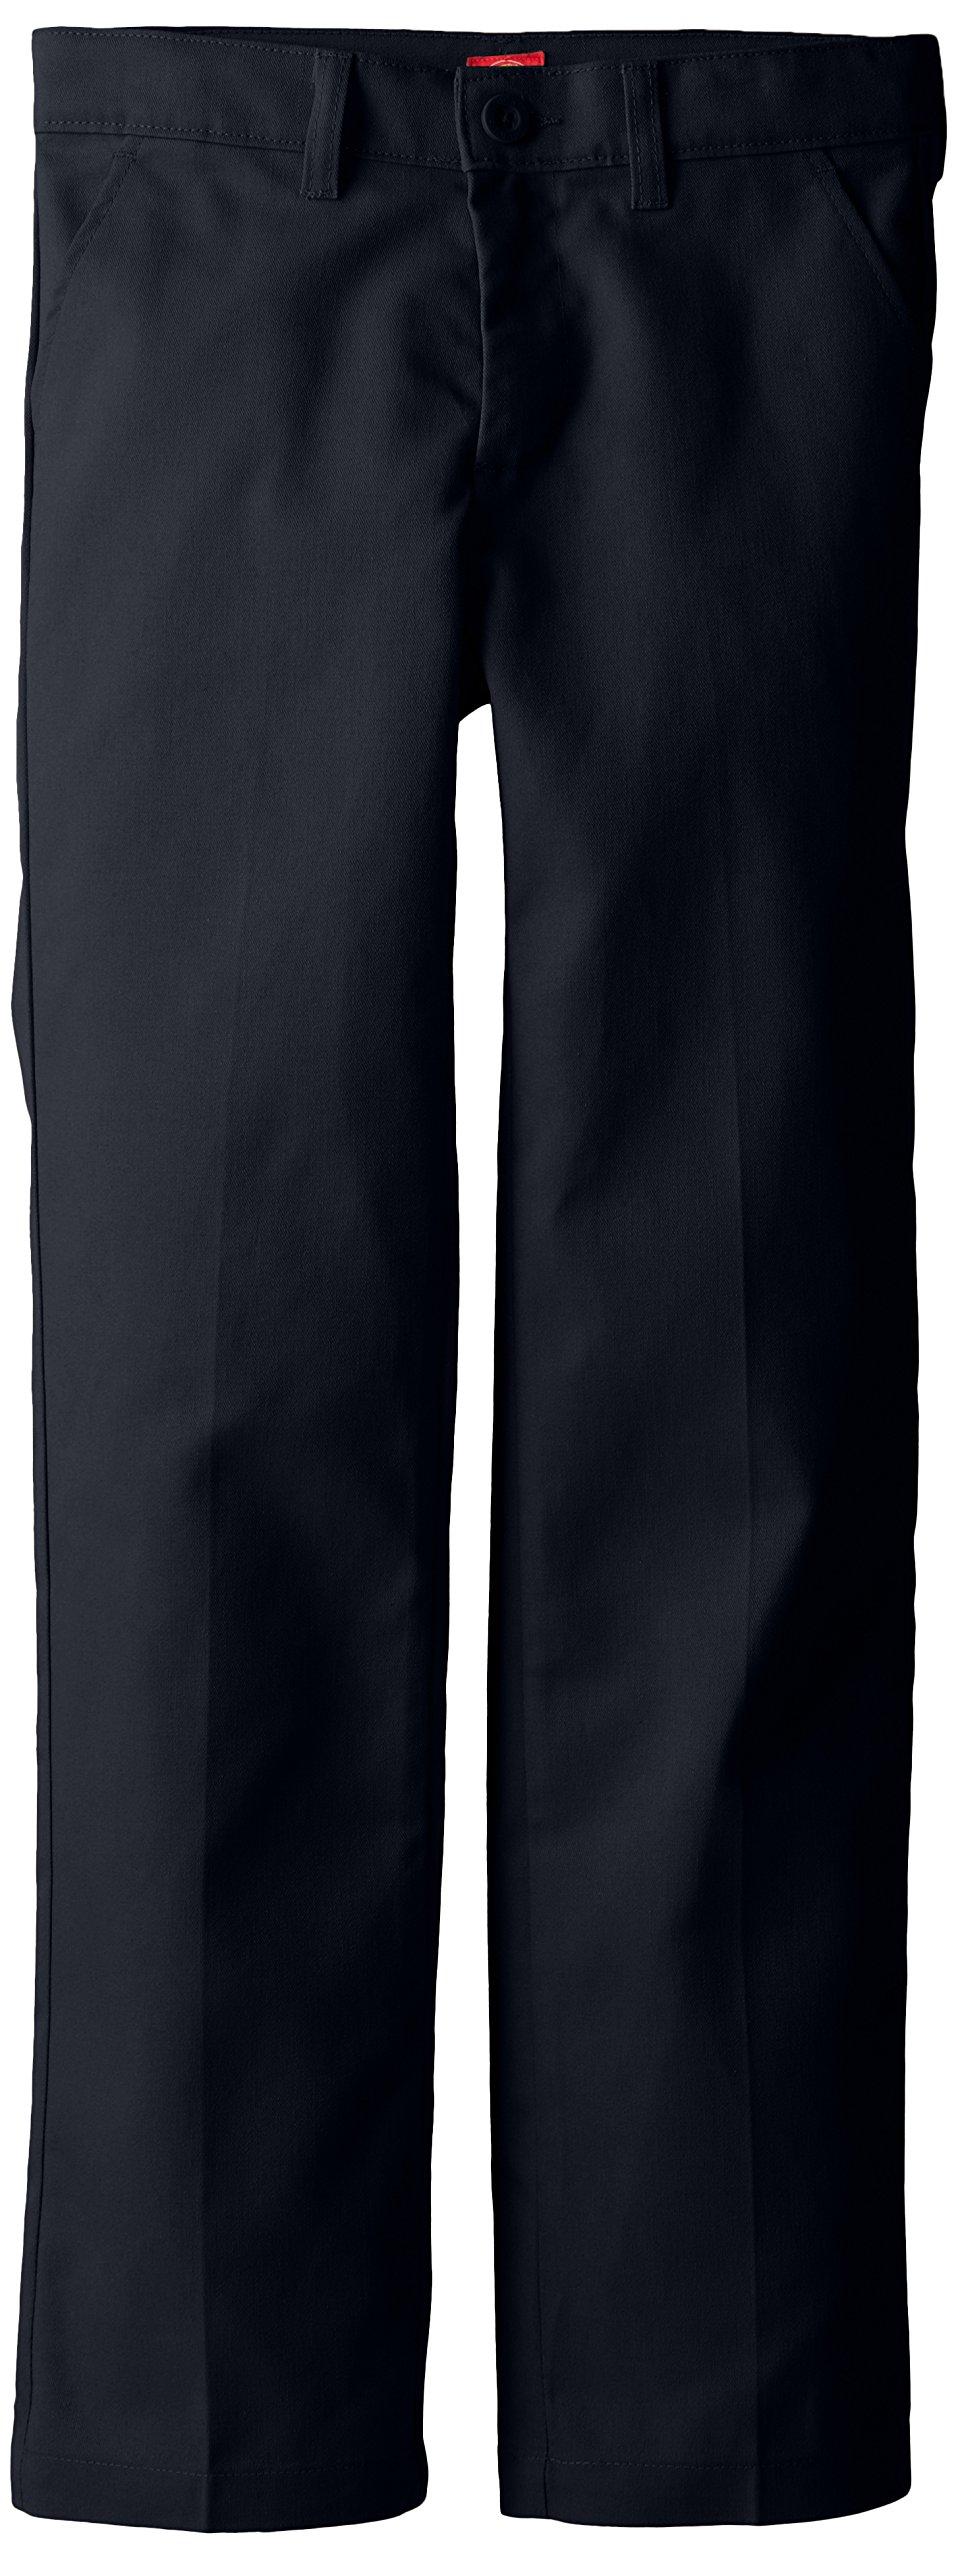 Dickies Big Girls' Slim Stretch Flat Front Pant, Dark Navy, 16 Regular